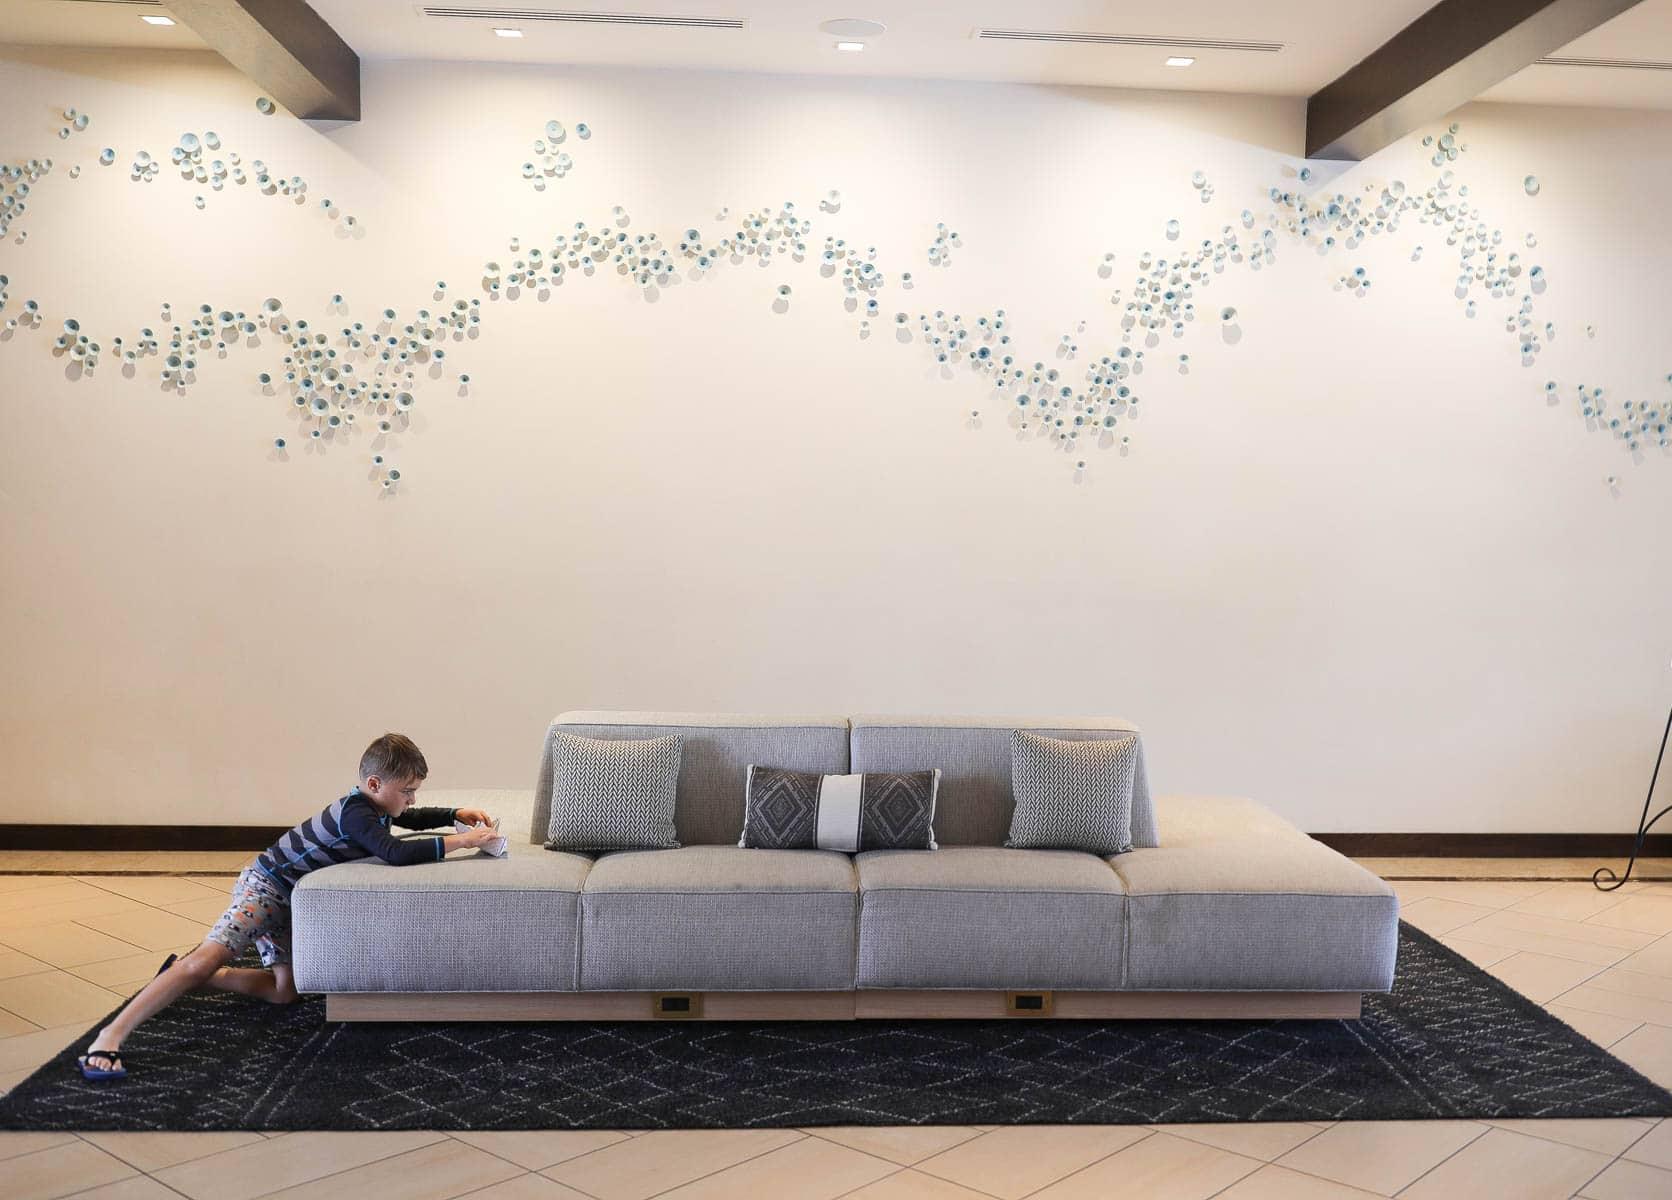 Hotel Waiting Area #familytravelsandiego #sandiego #fourseasonsresidenceclub #bigfamilytravel